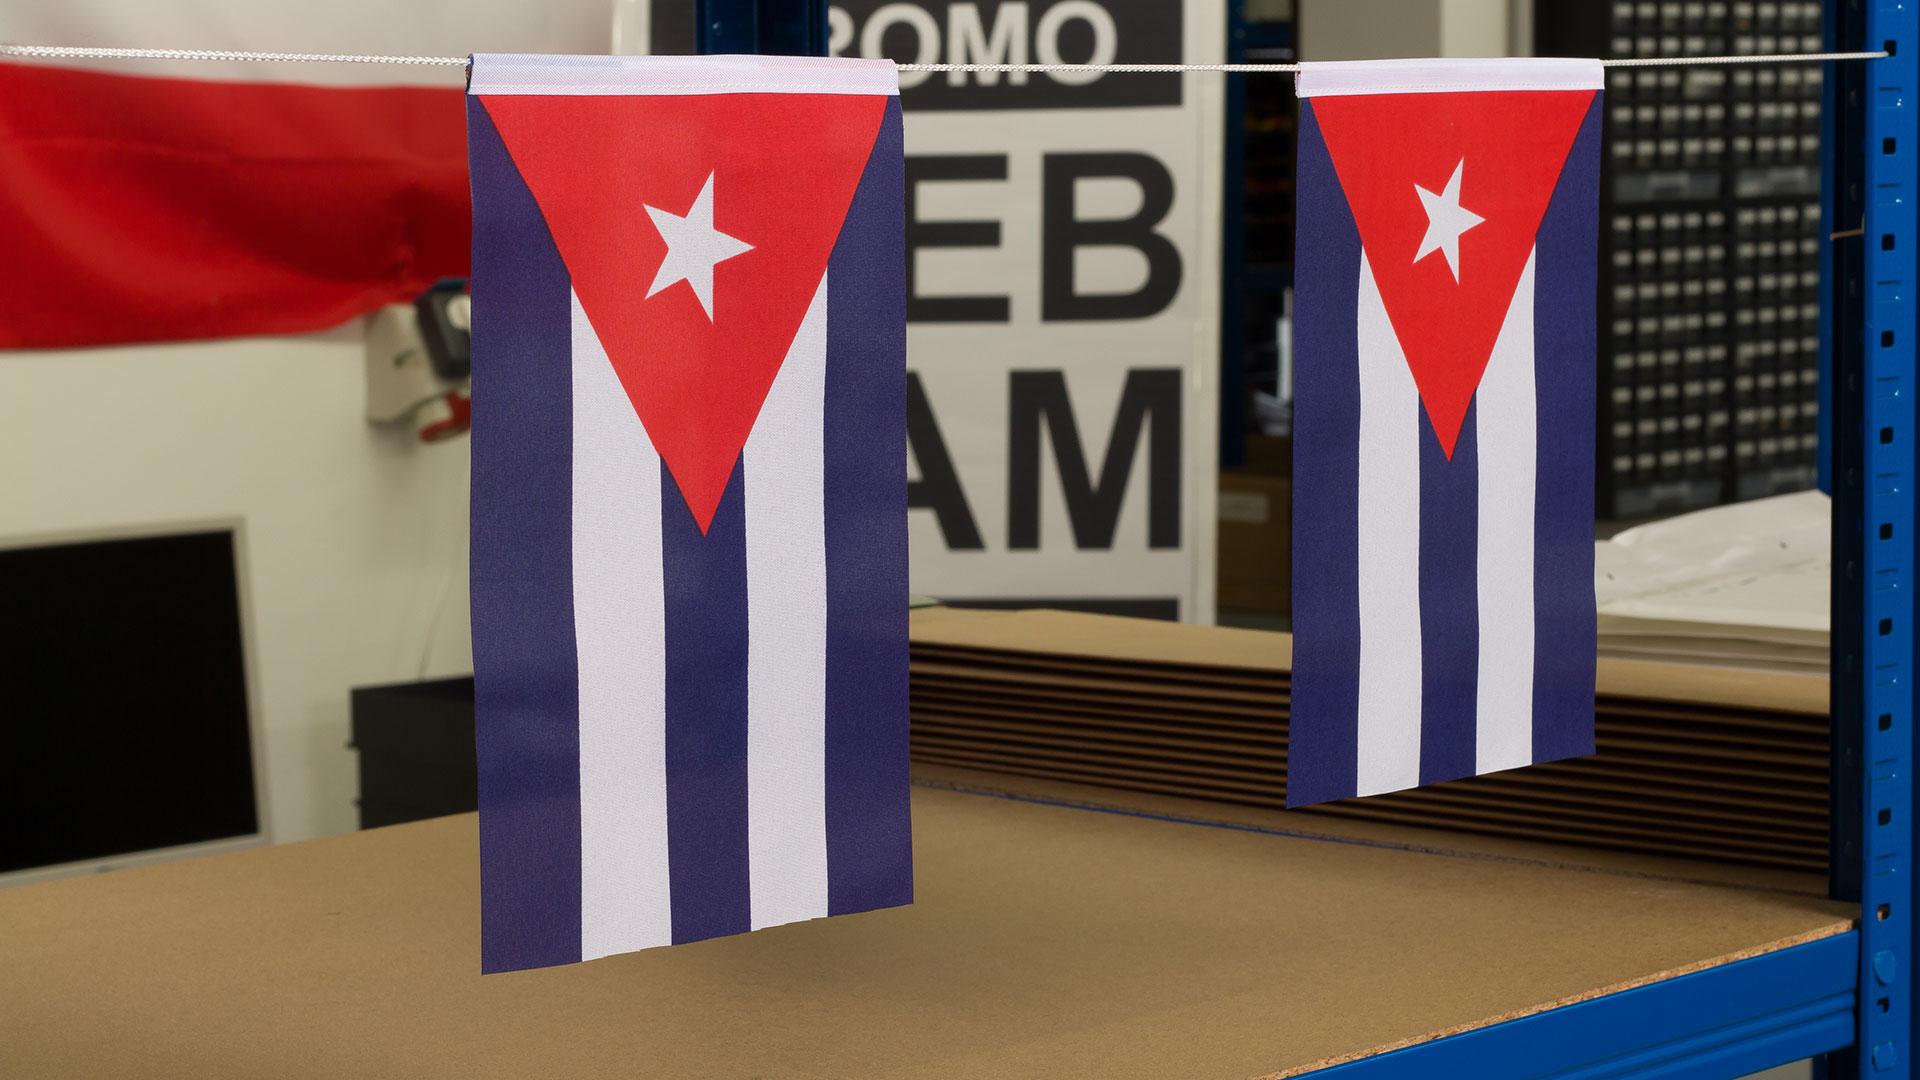 Kuba minifahne 15 x 22 cm flaggenplatz Kuba dekoration